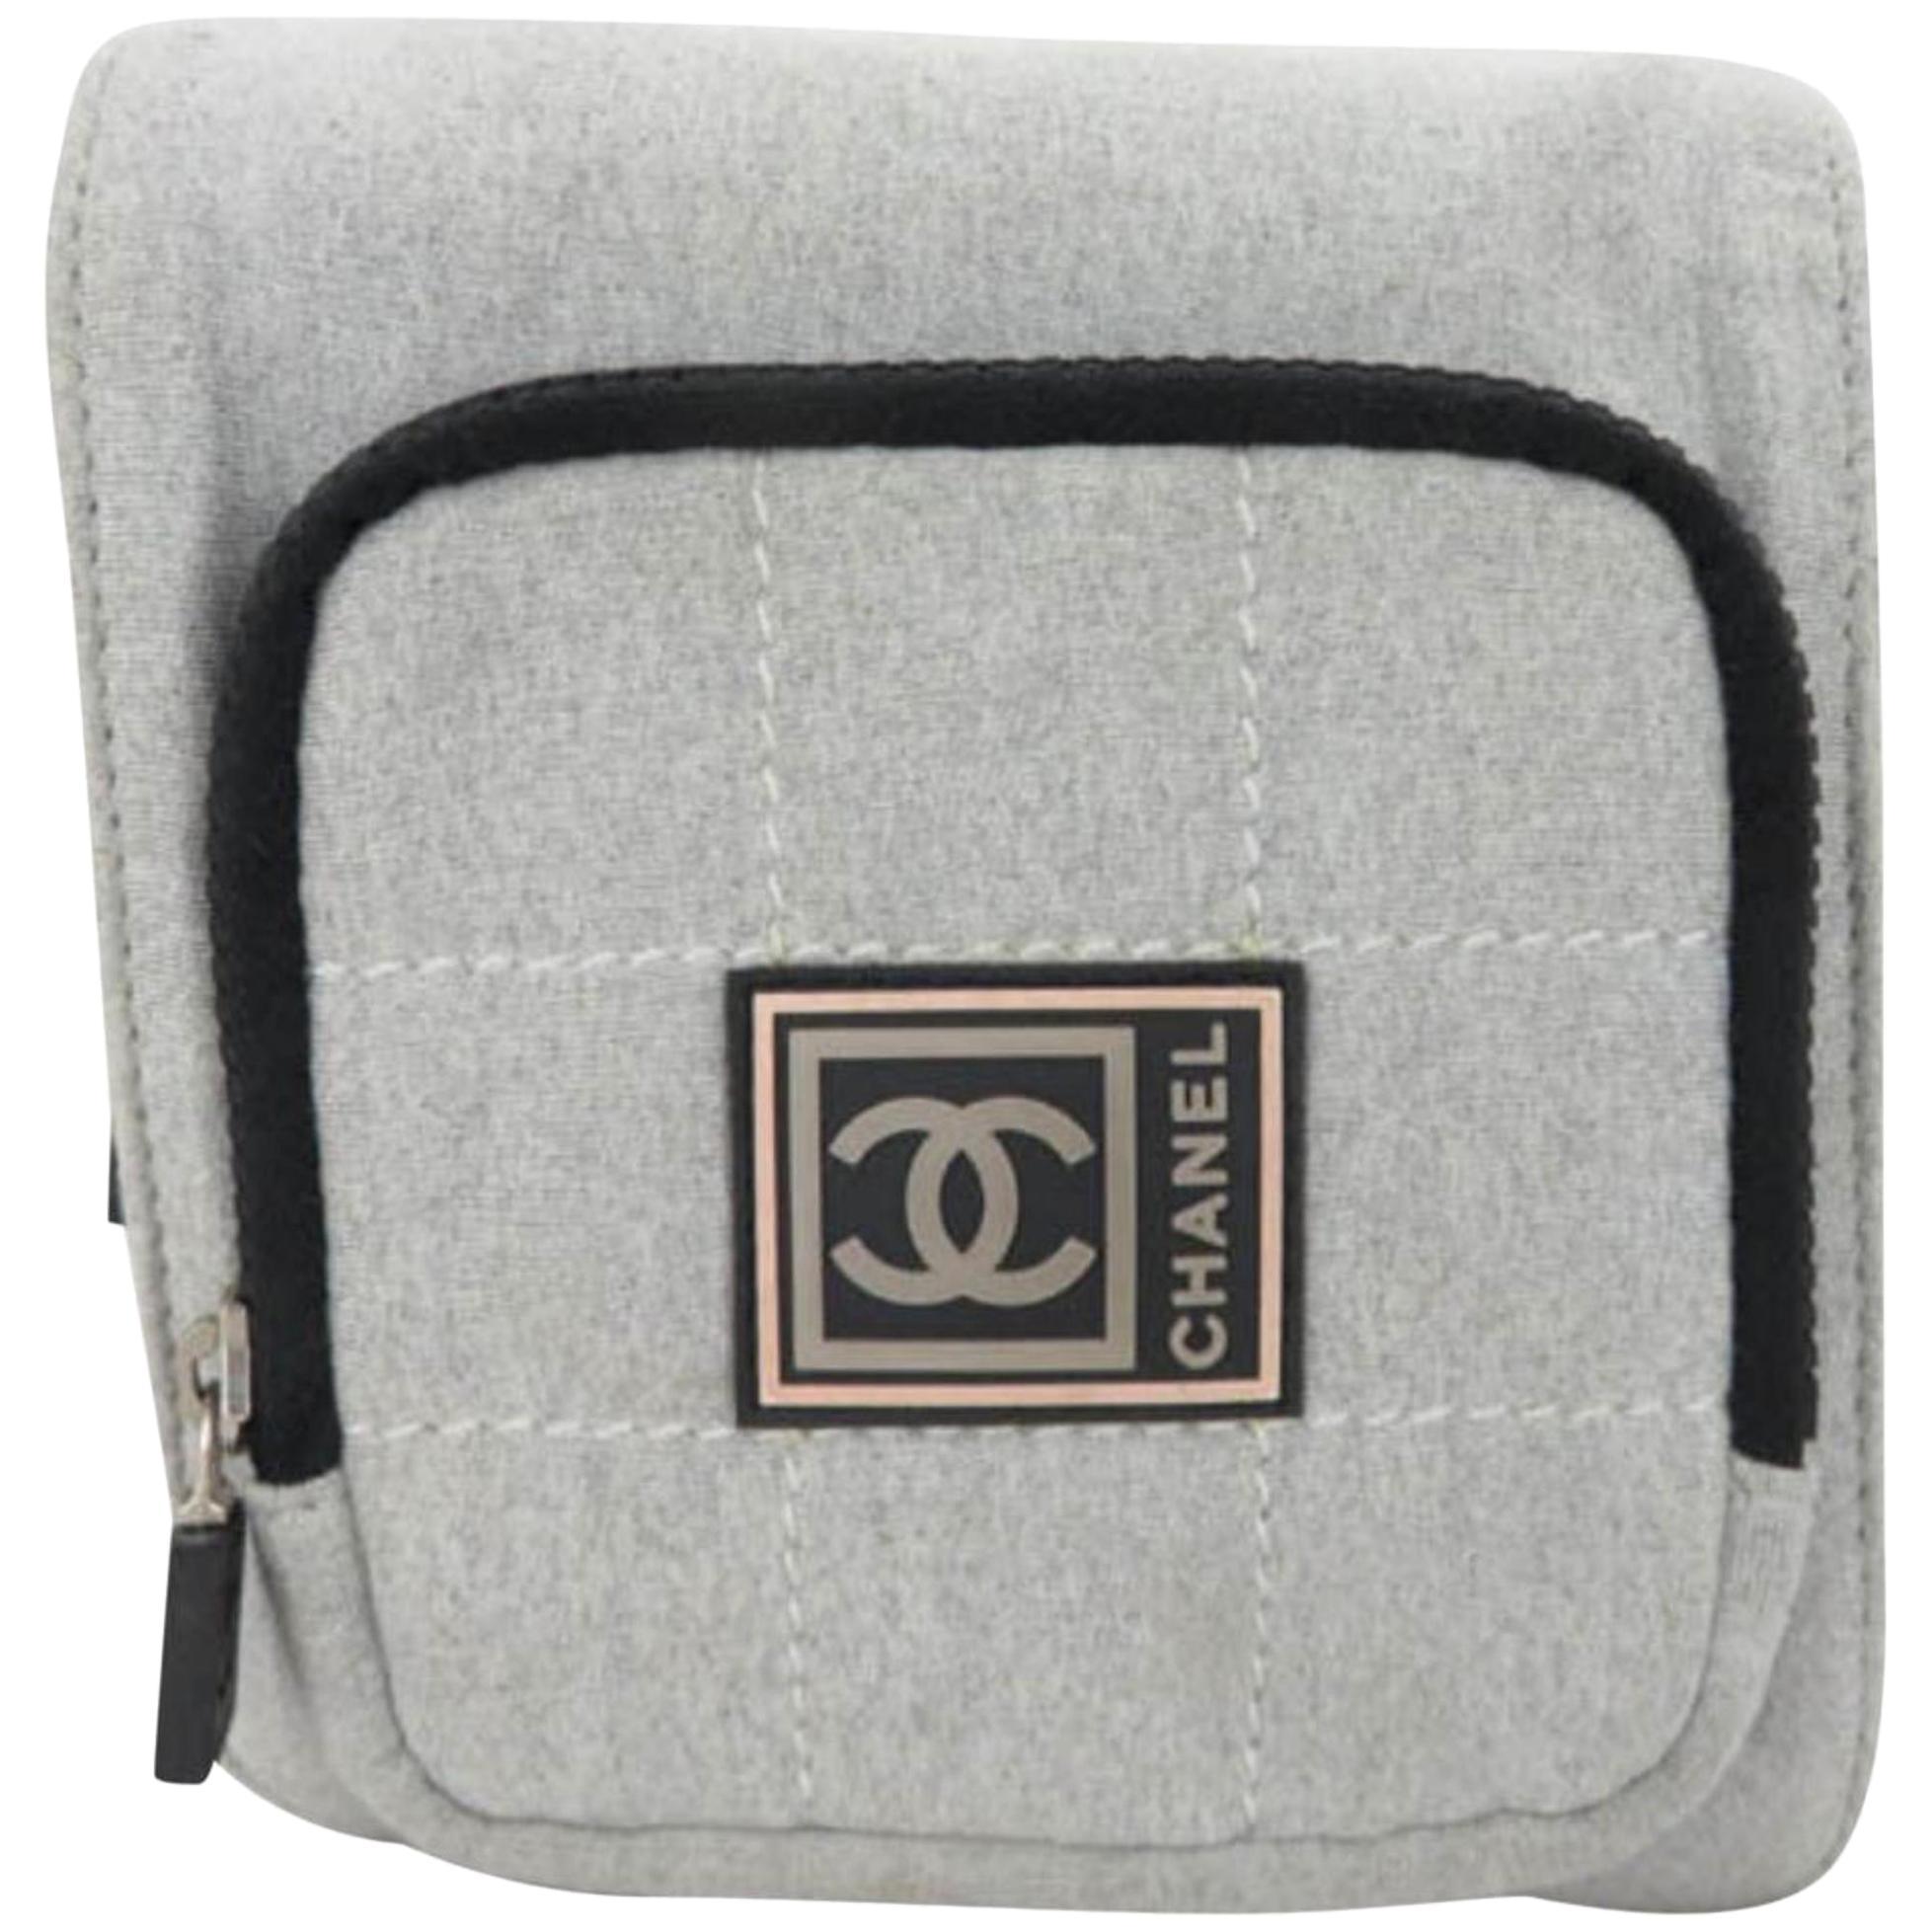 e4c9efcc7da2 Chanel Cc Logo Sport Waist Pouch Fanny Pack 867345 Grey Cotton Cross Body  Bag at 1stdibs